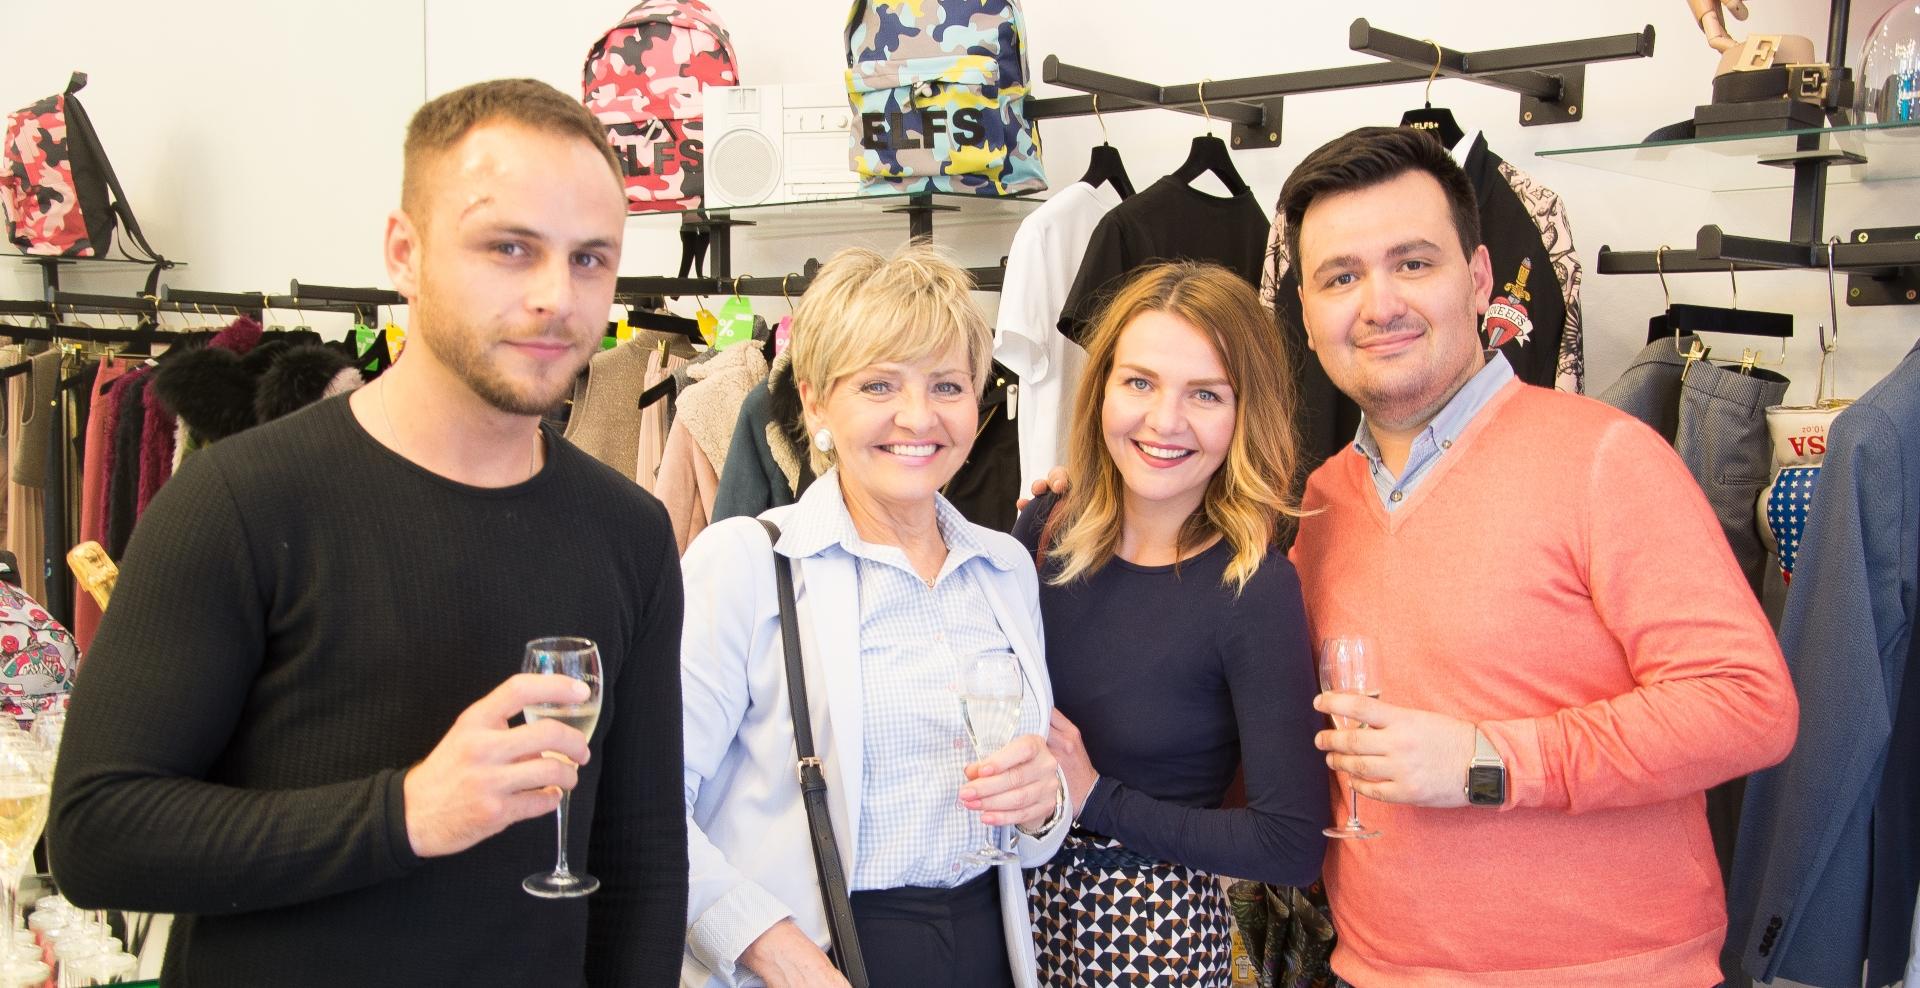 FOTO: ELFS organizirao VIP shopping nove kolekcije